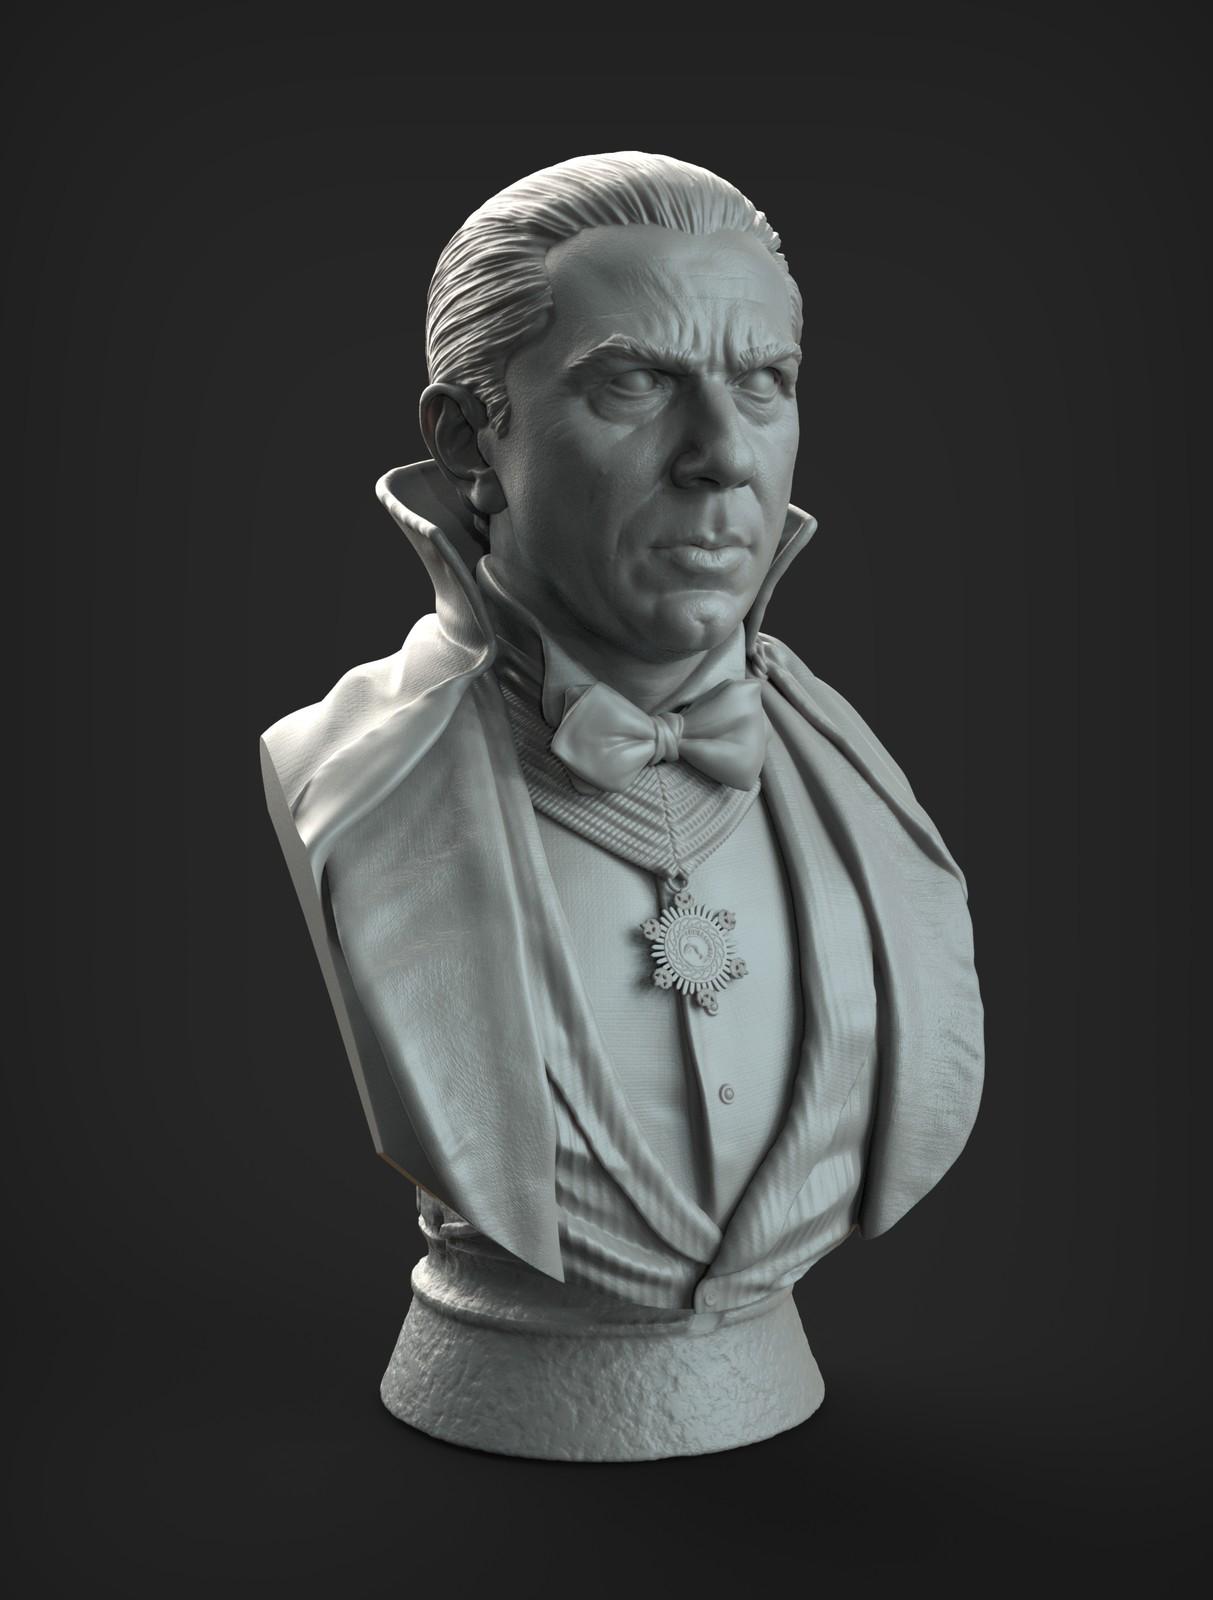 Bela Lugosi tribute bust